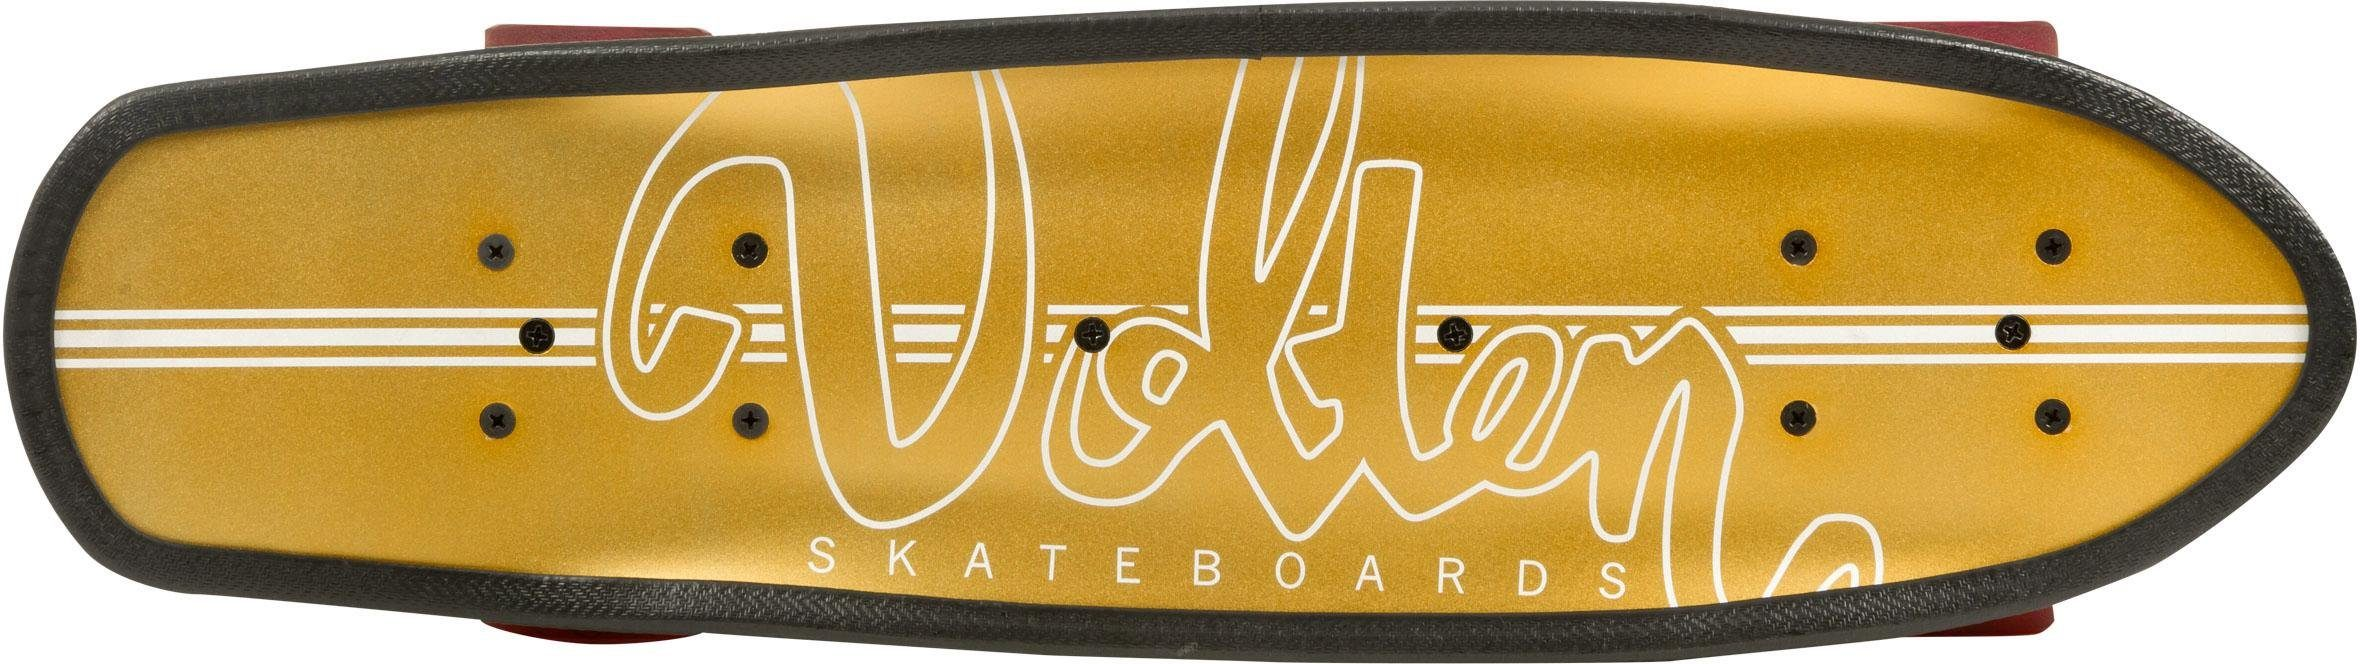 Volten Shortboard »Vanguard«